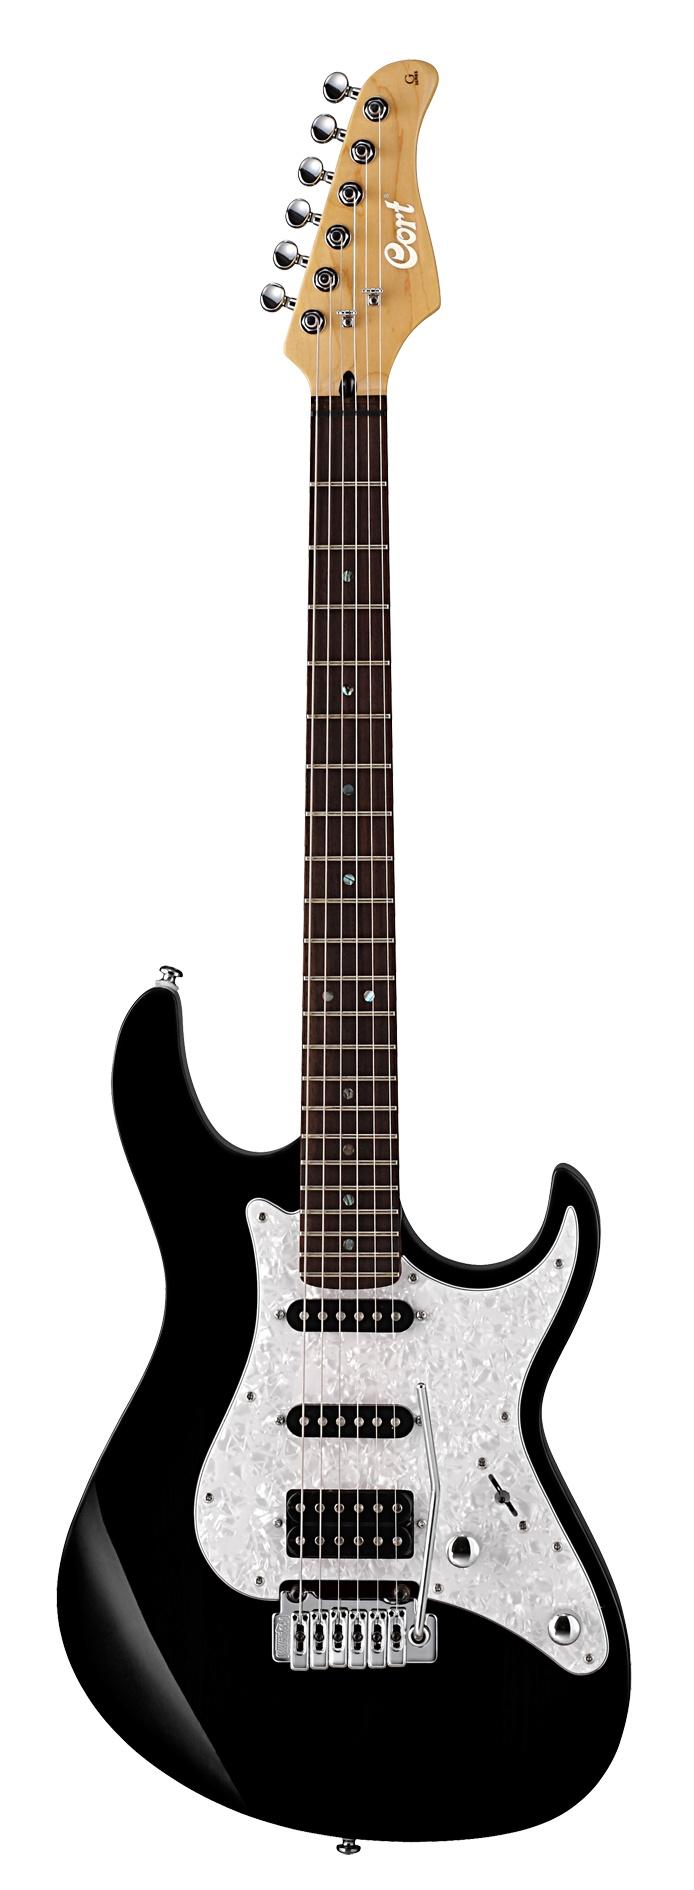 Cort E-Gitarre G250 schwarz